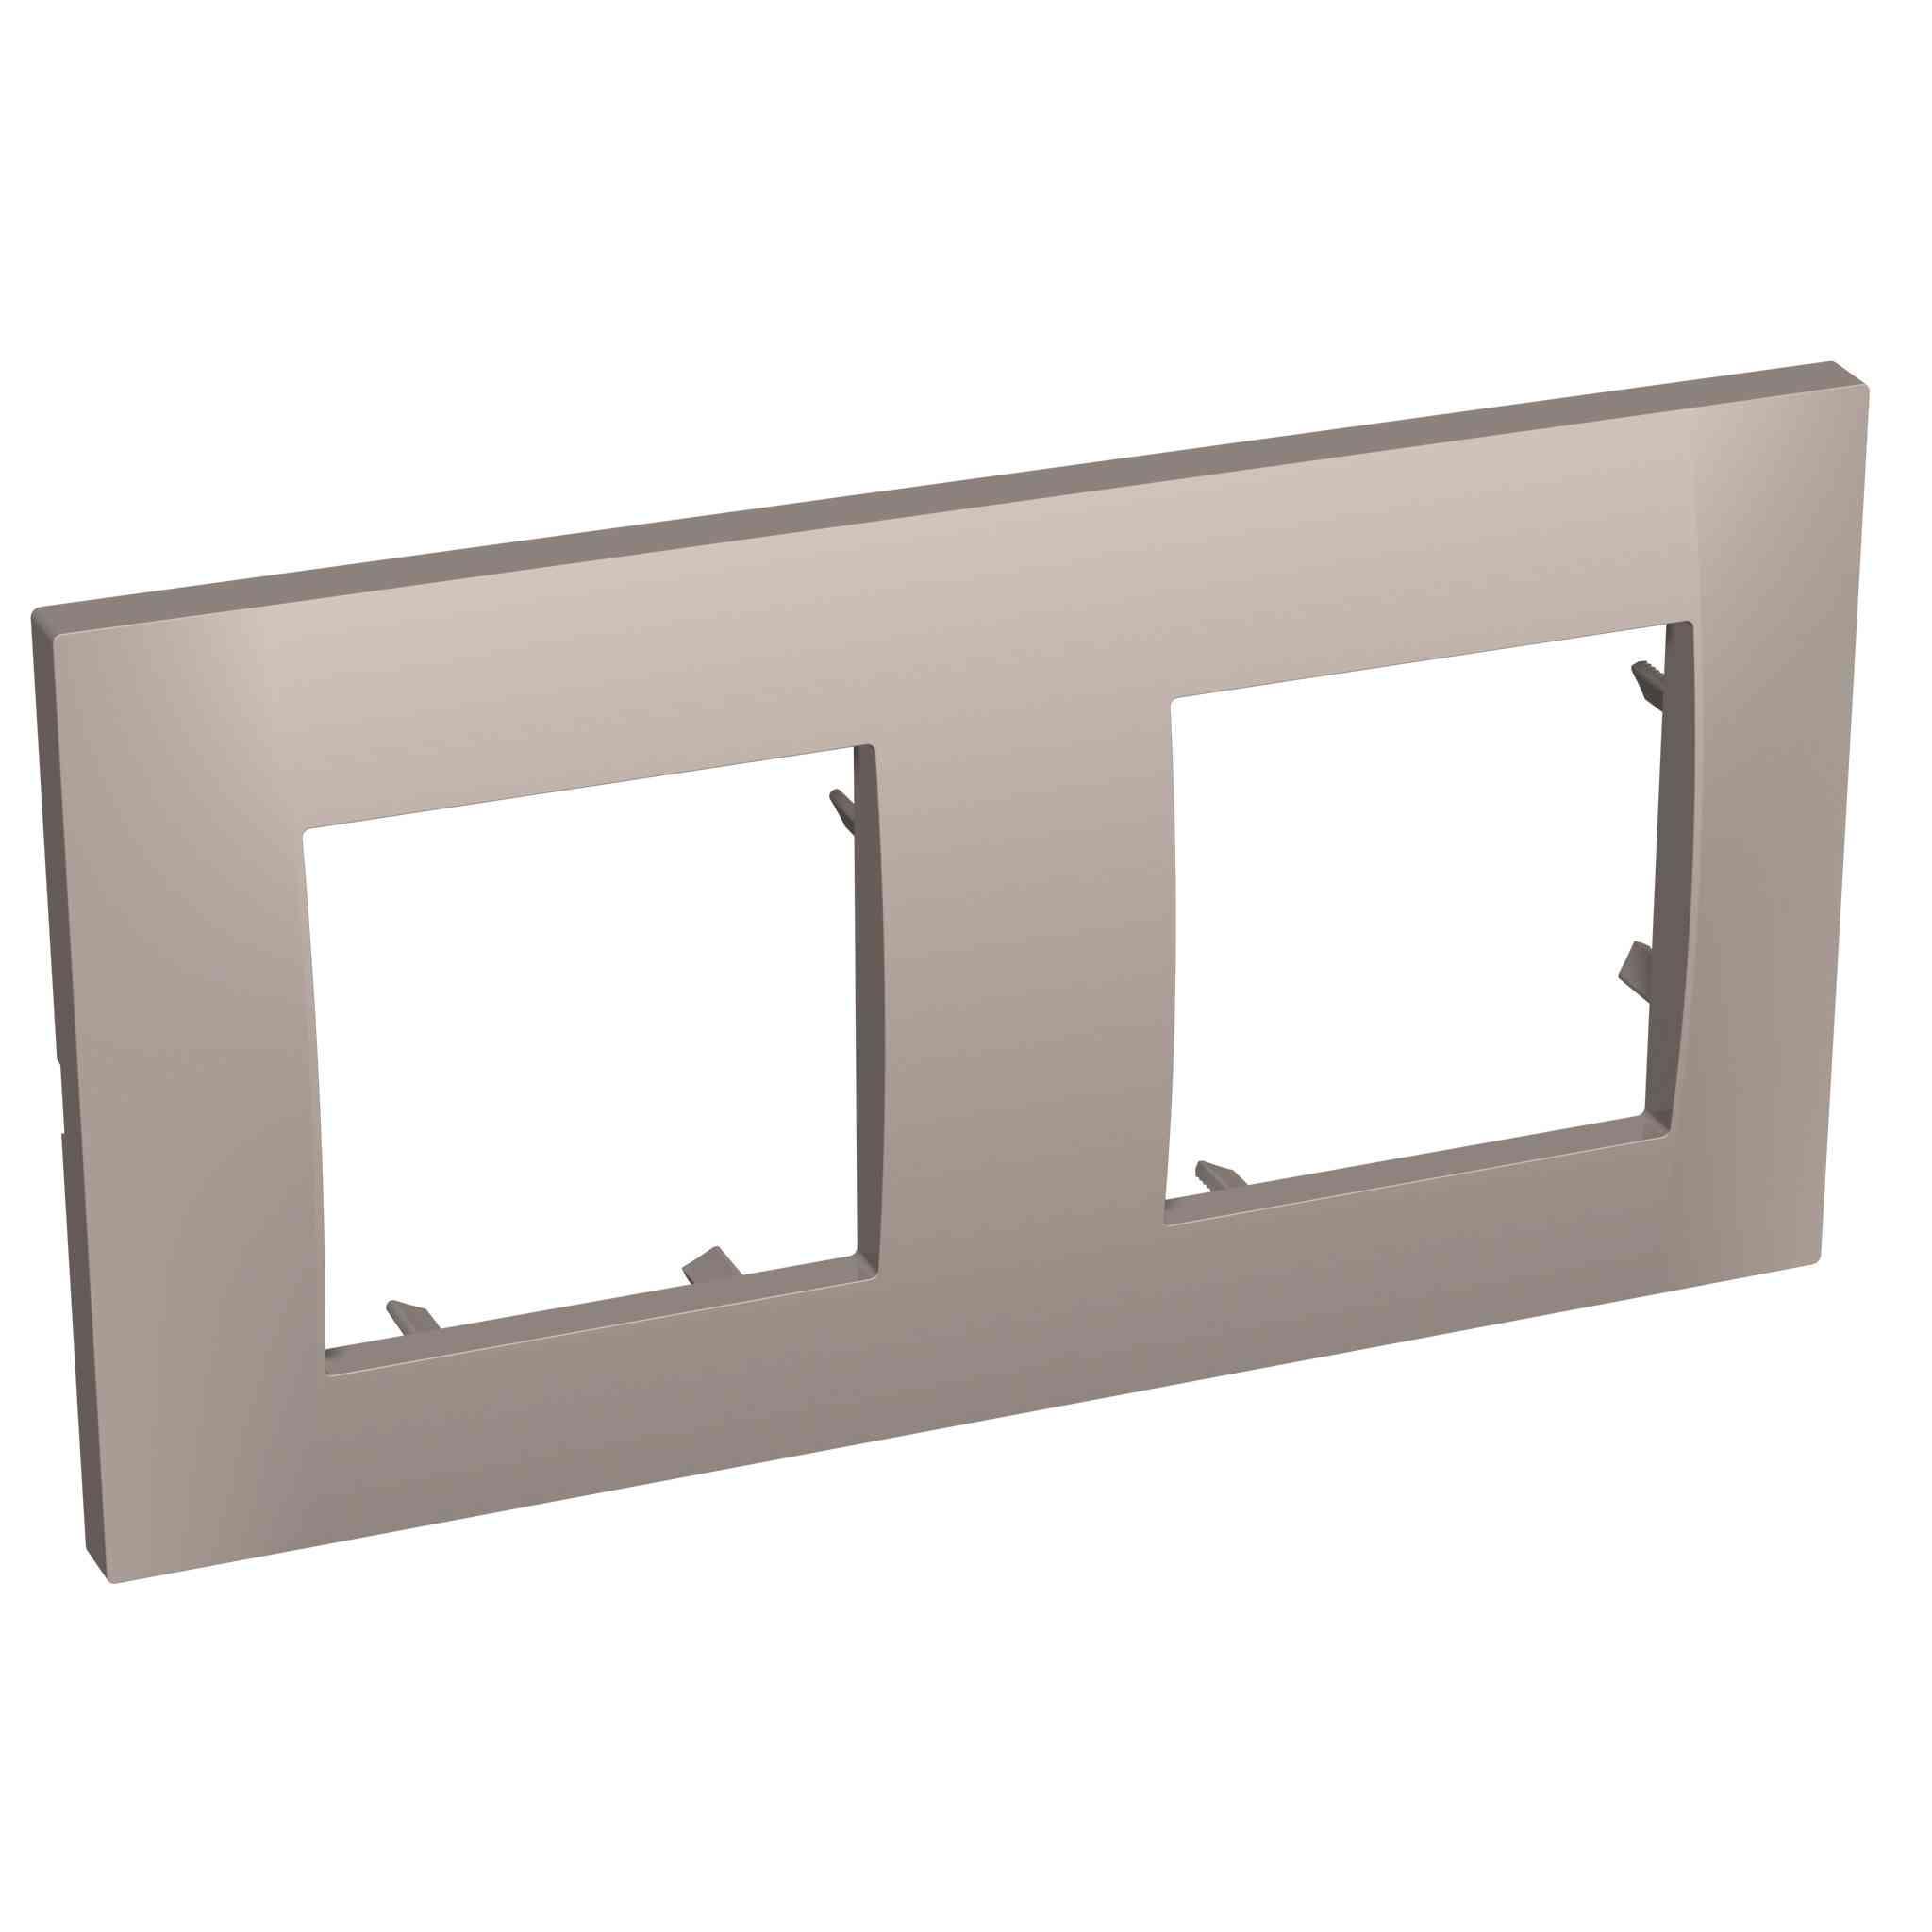 Altira - dekorativni okvir - 2 odprtini vodoravno - granit - 71 mm